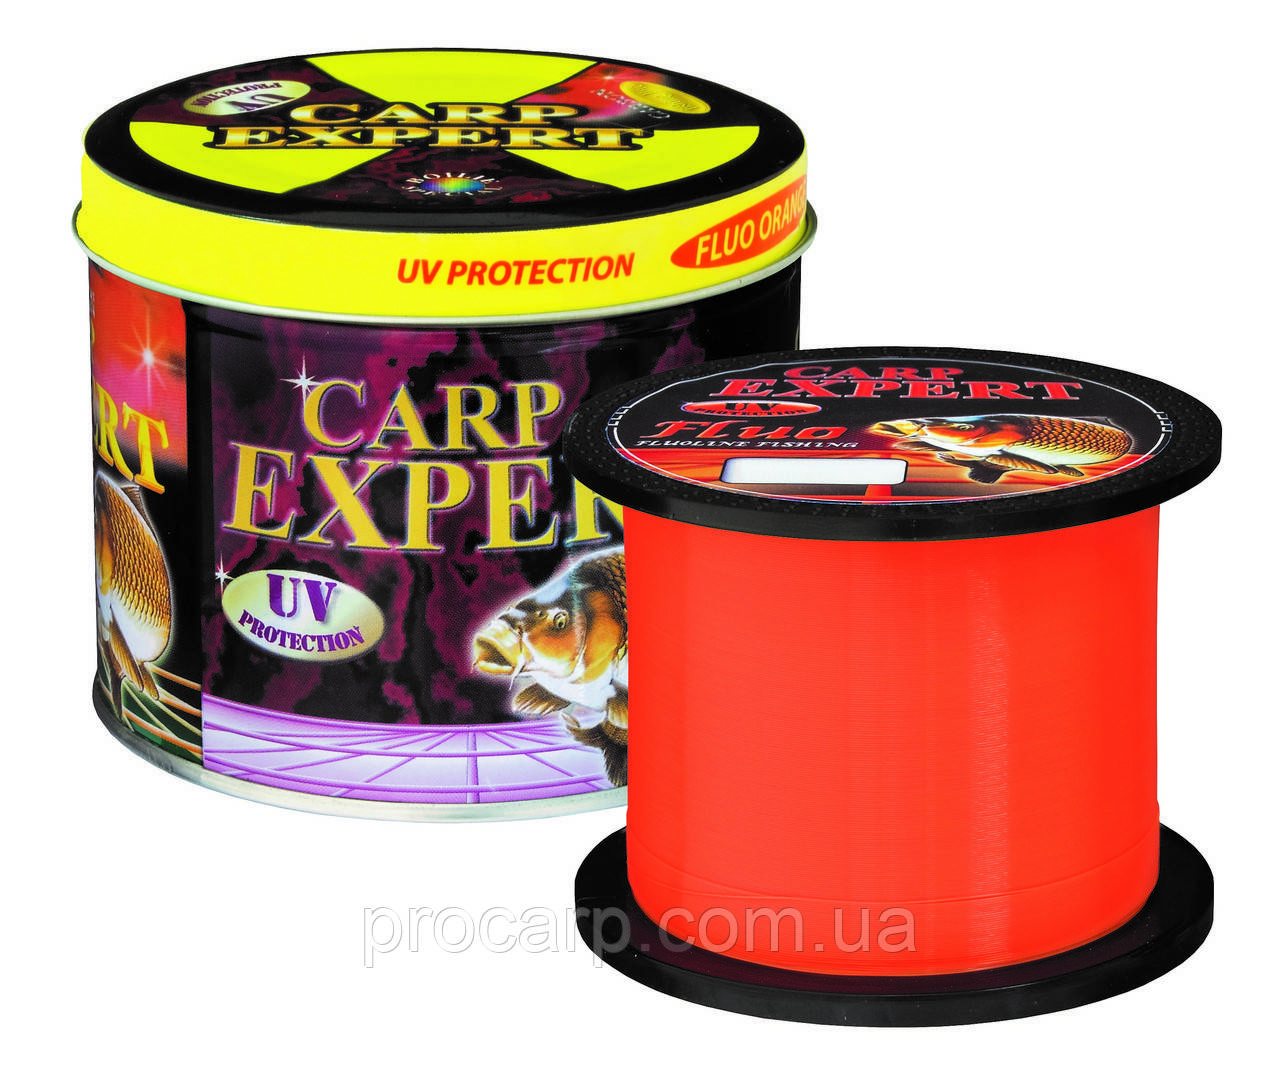 Леска Energofish Carp Expert UV Fluo Orange 960 м 0.50 мм 23.57 кг (30114850)